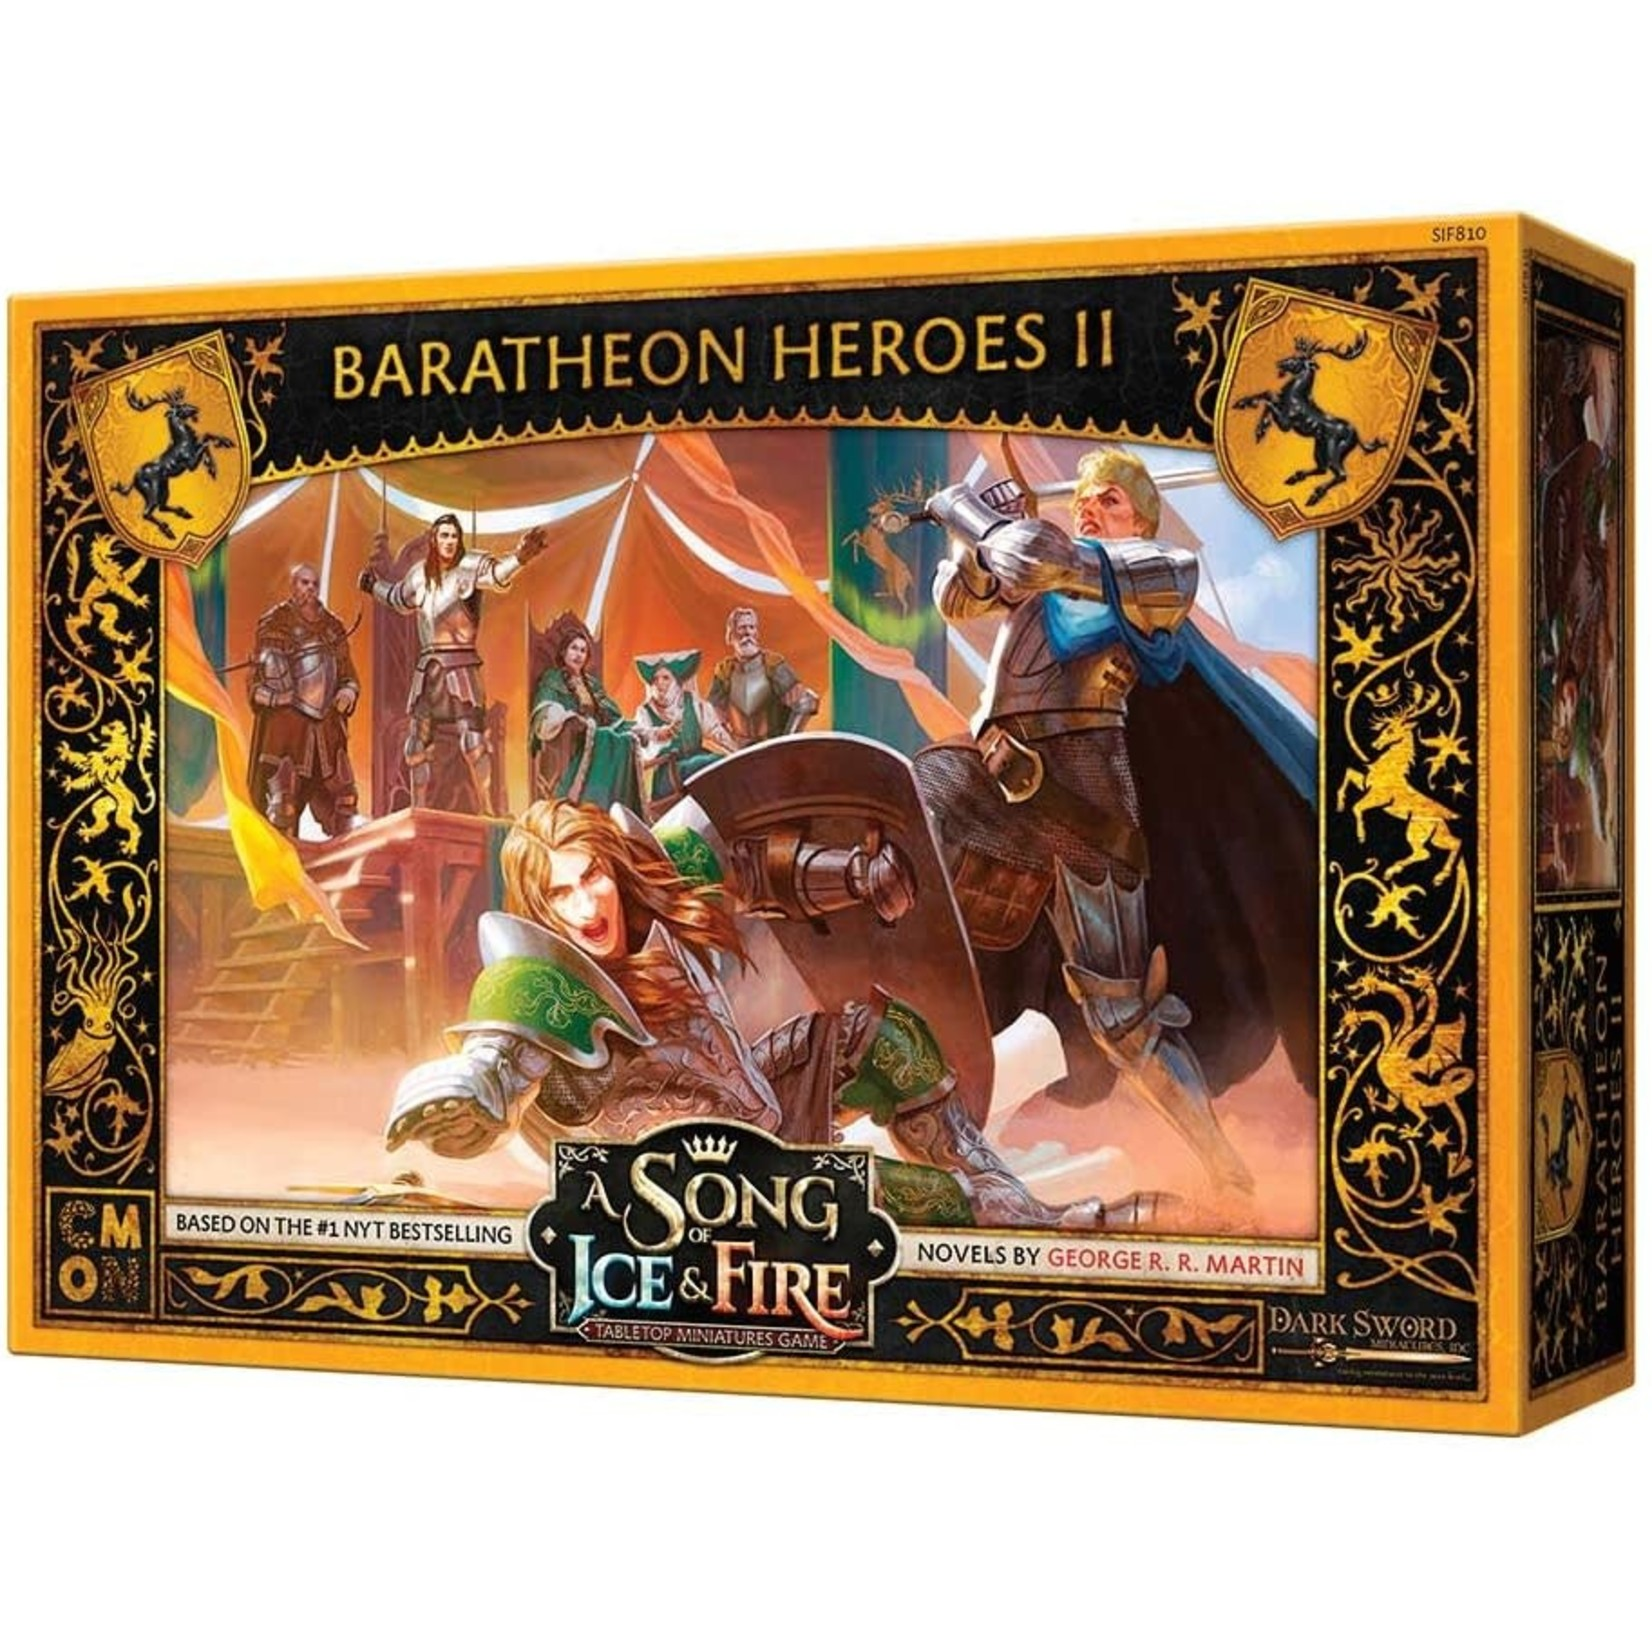 Asmodee A Song of Ice & Fire Baratheon Heroes II